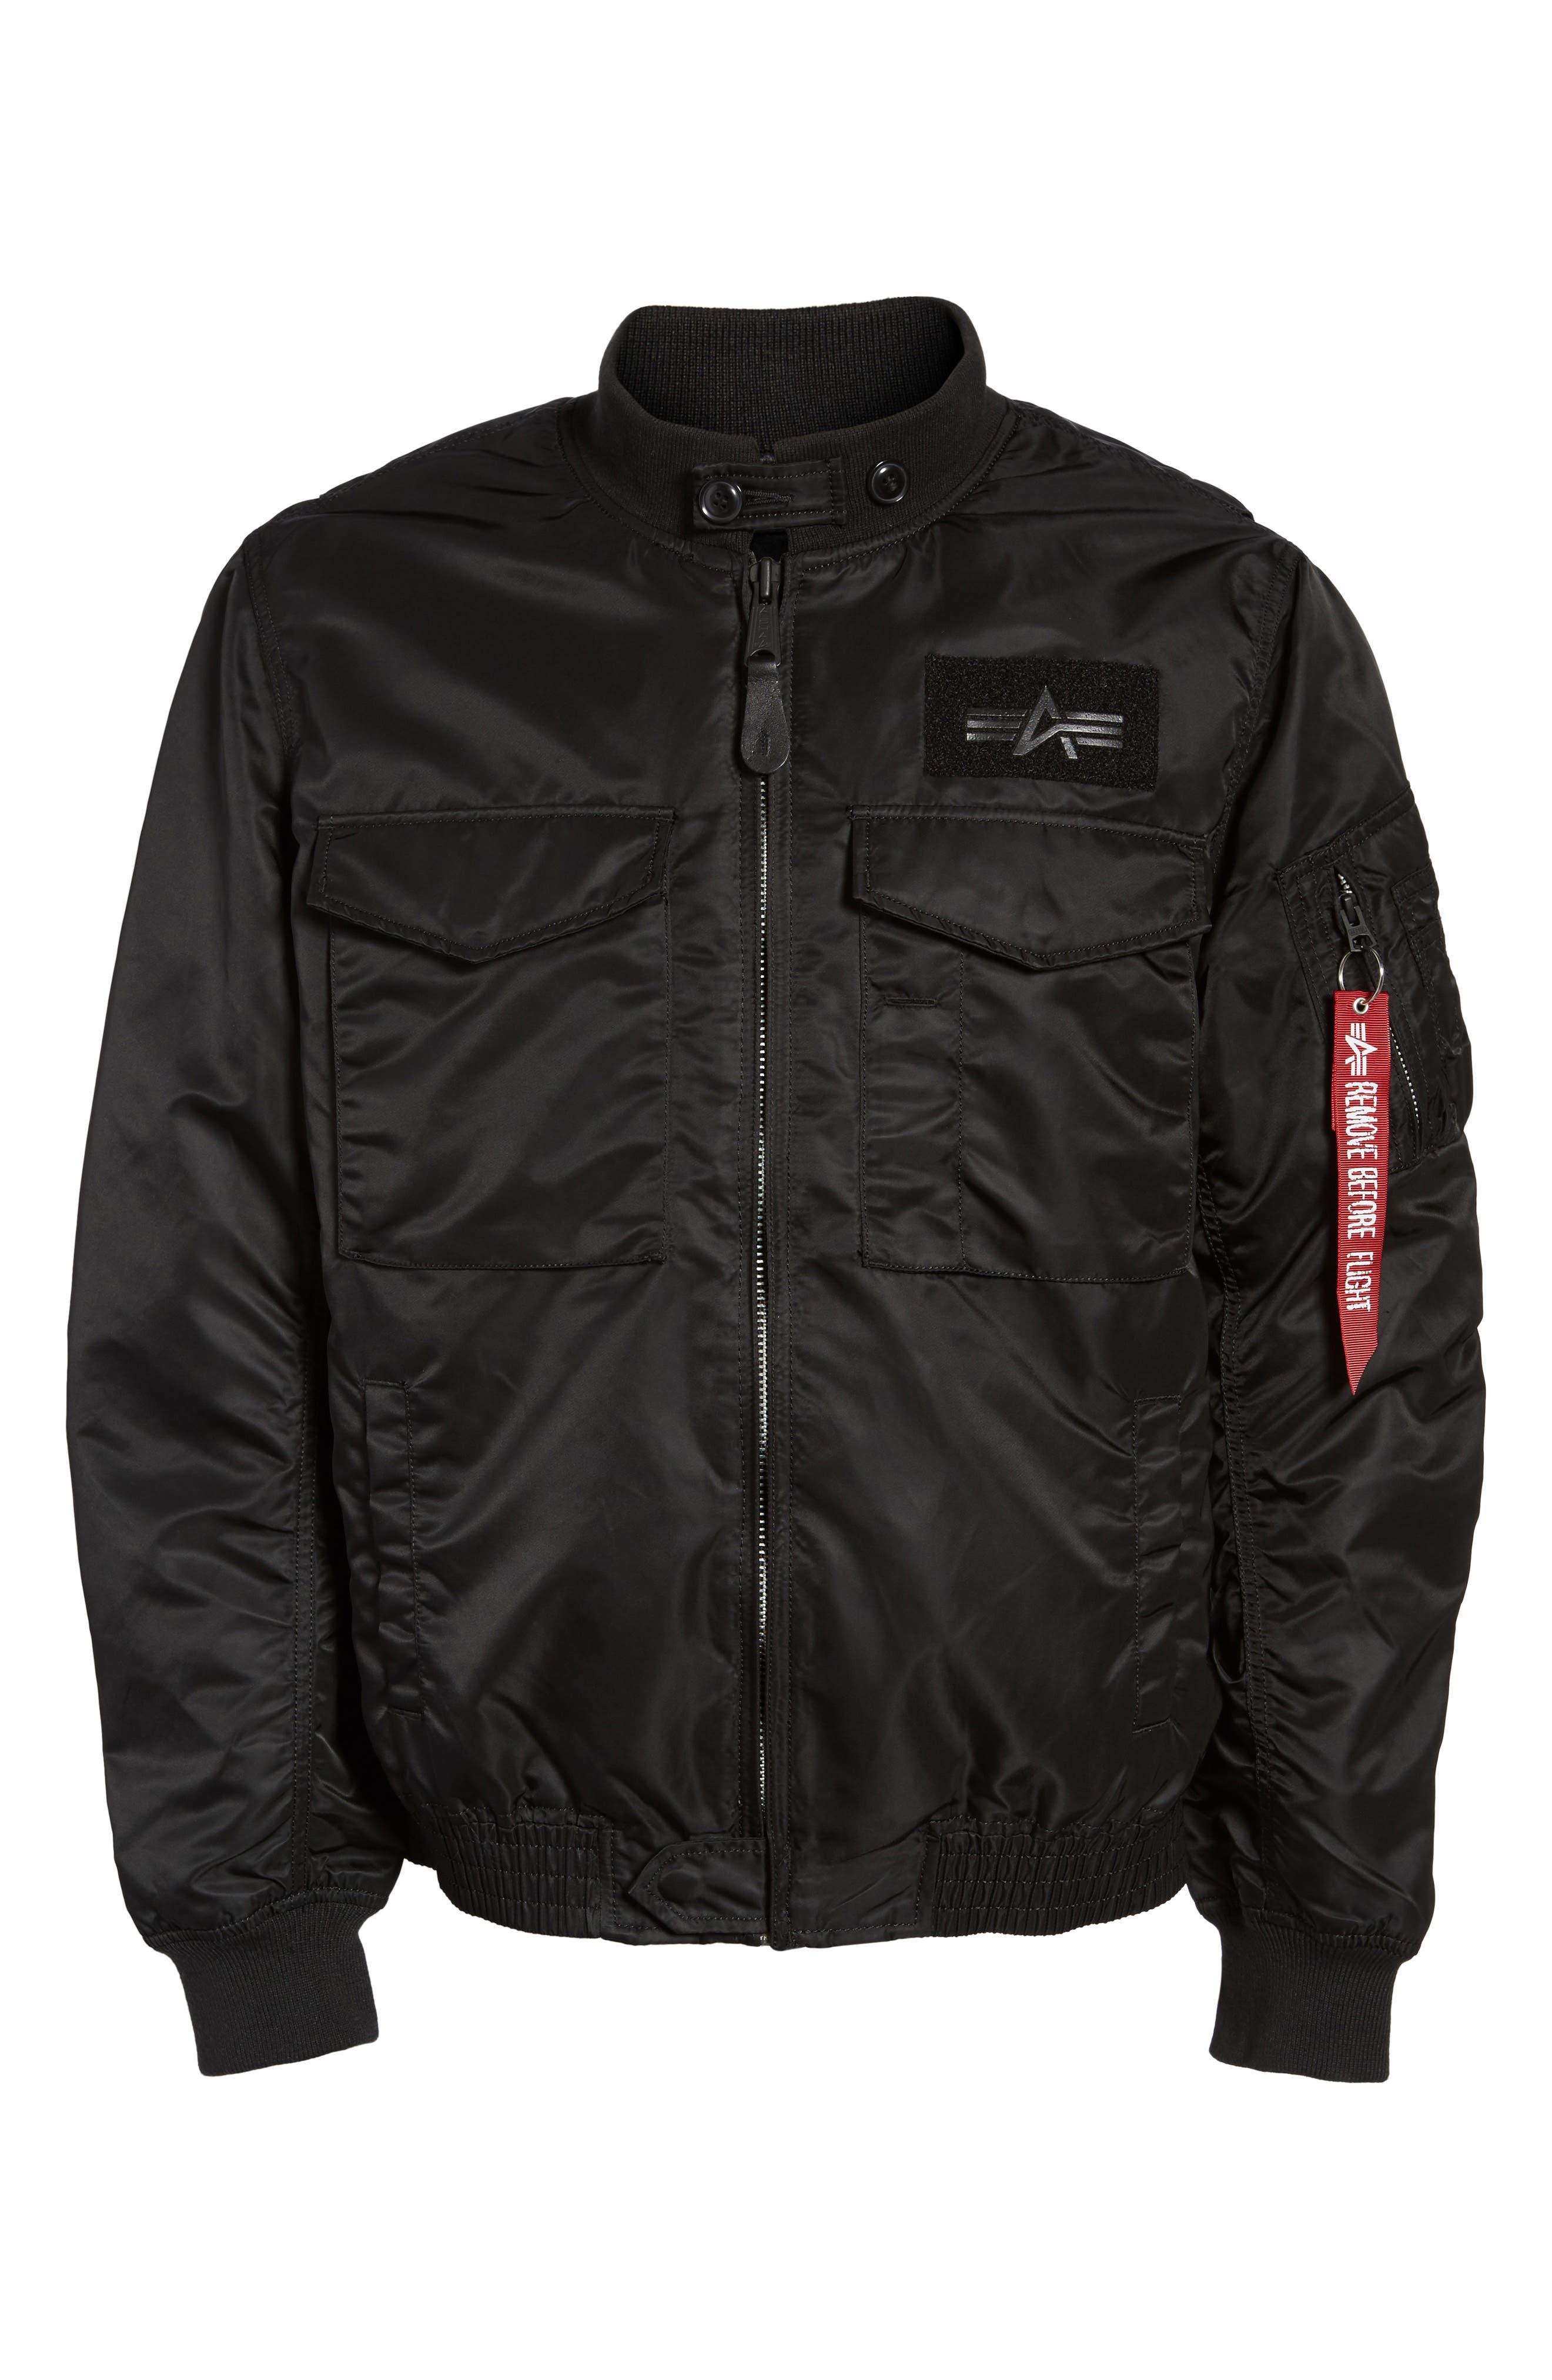 Weps Mod Jacket,                             Alternate thumbnail 5, color,                             001